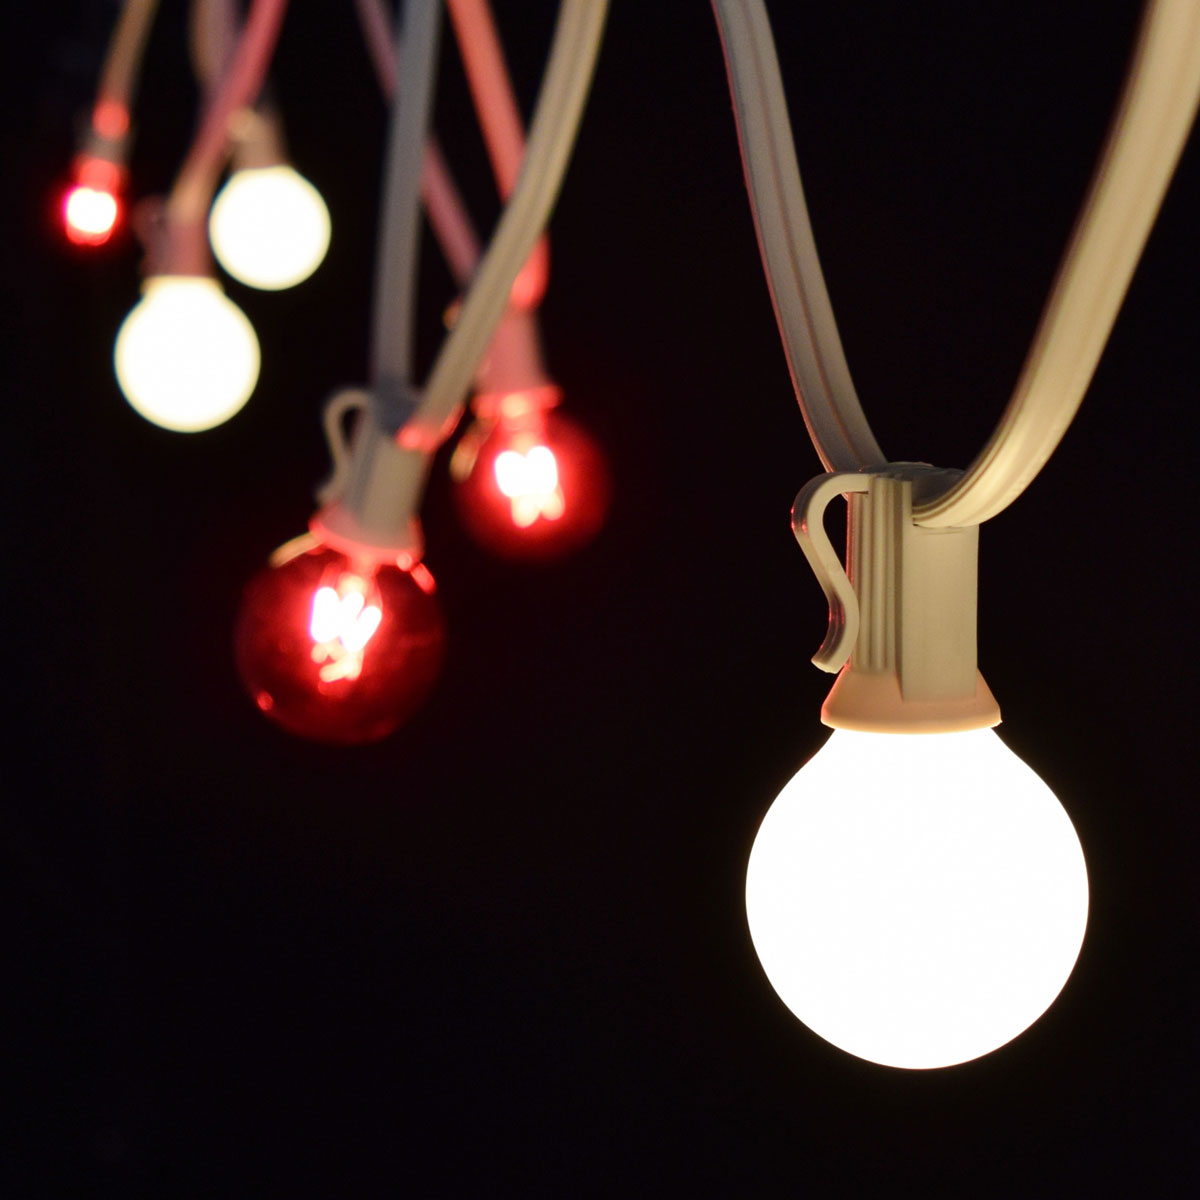 Christmas Lights - Commercial Cord and Bulb Kits